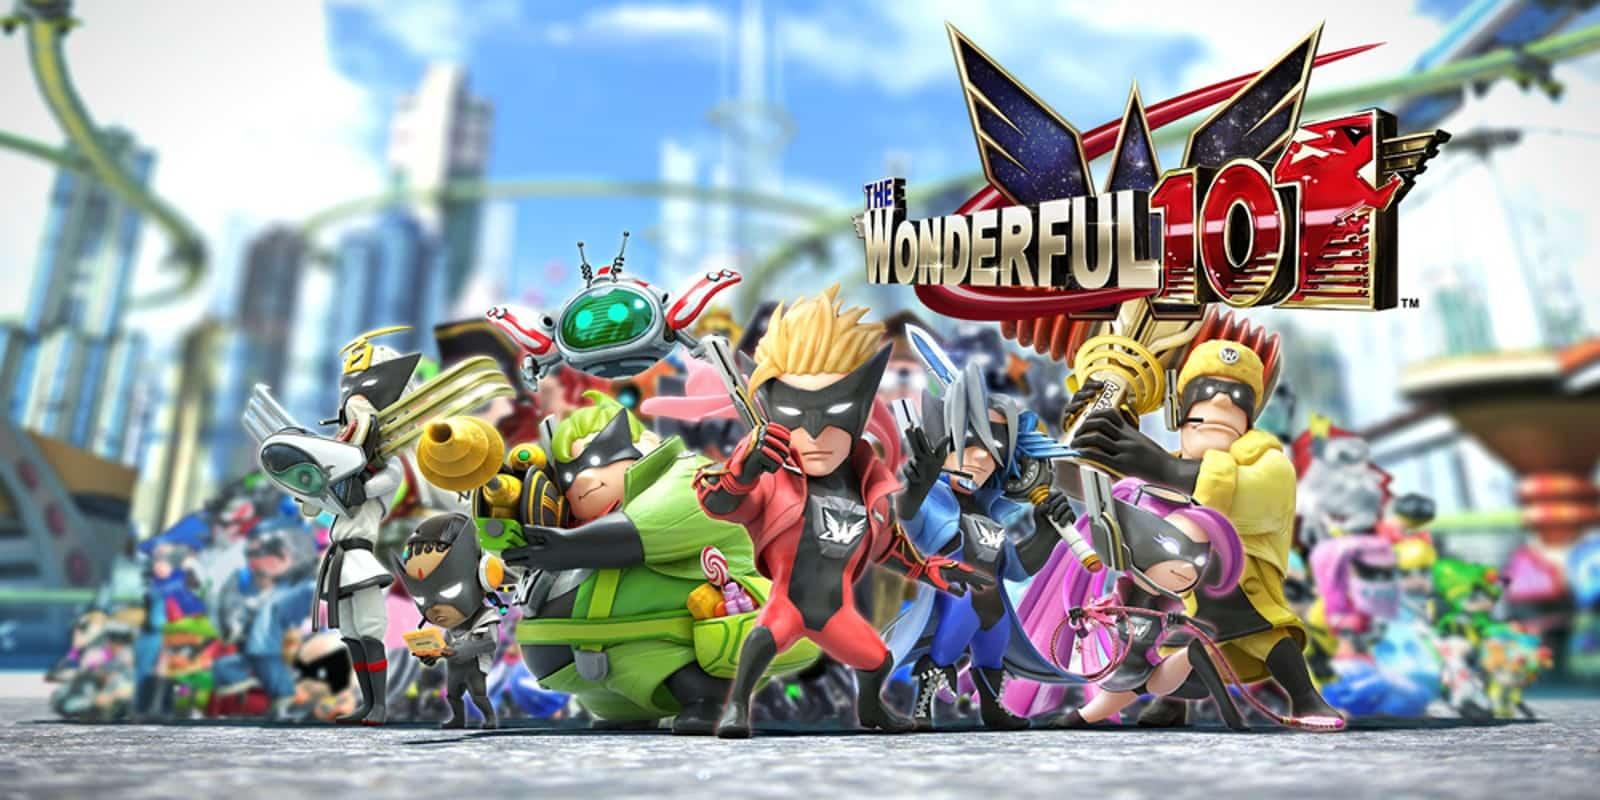 Nintendo Switch Ita cover image